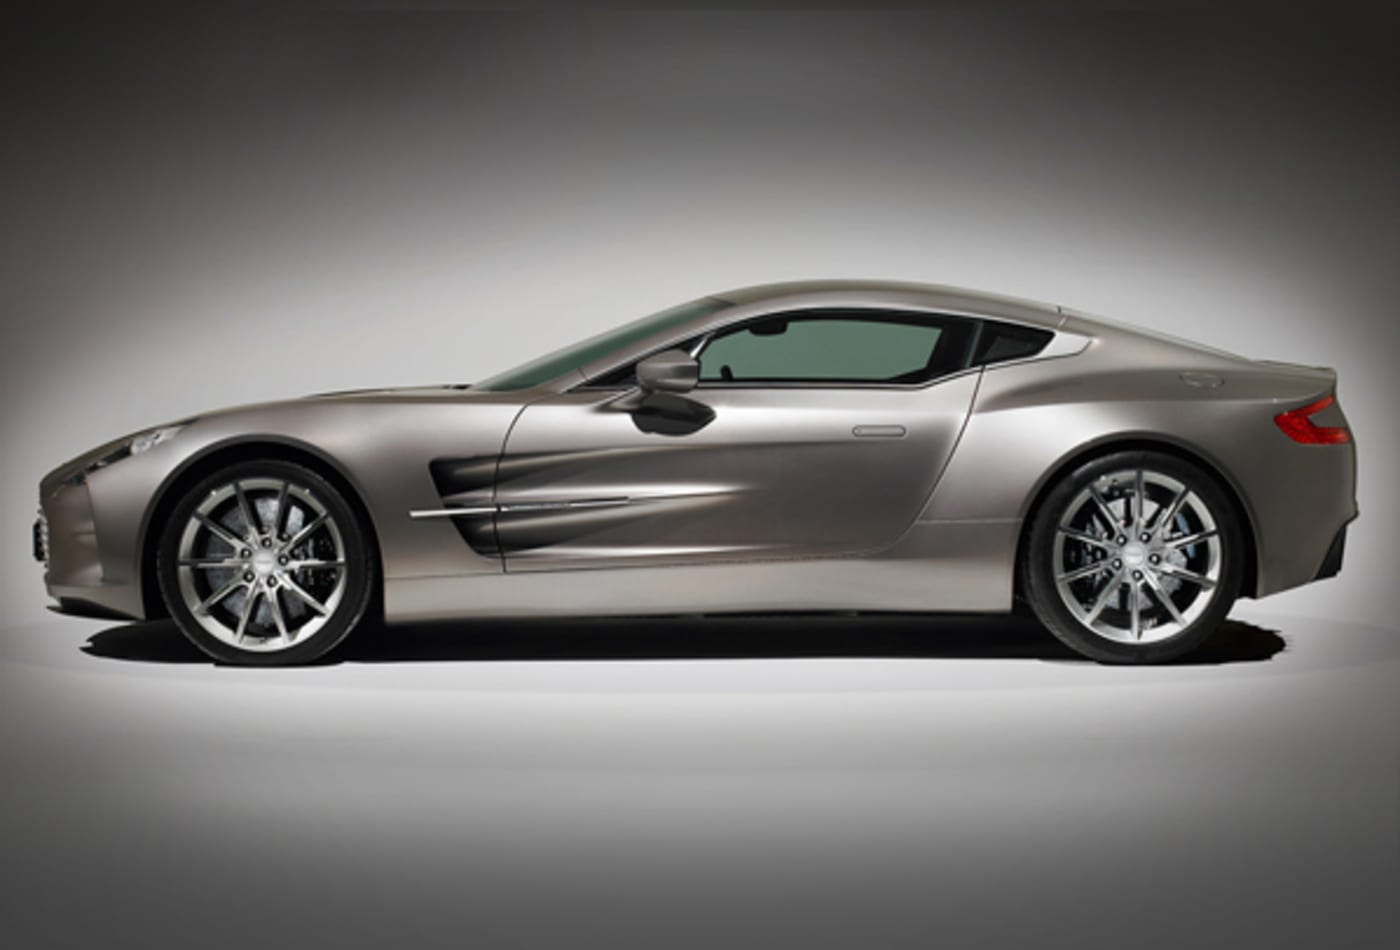 SS_Million_Dollar_Cars_Aston_Martin_One77.jpg